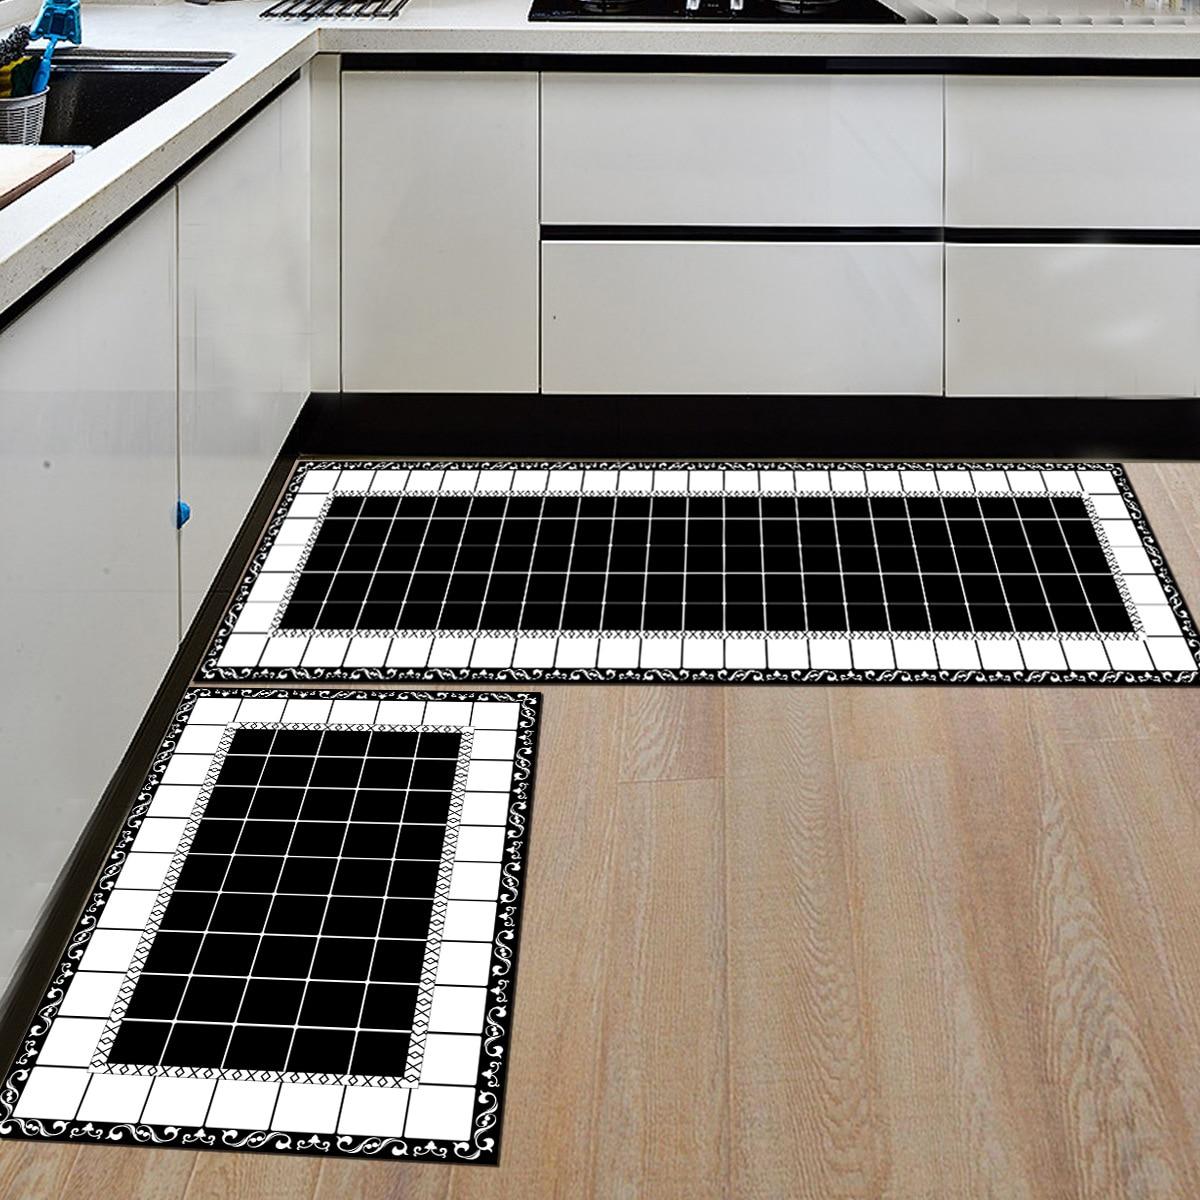 Zeegle 2pcs/set Black And White Nordic Floor Mats For Kitchen Anti-Slip Kids Bedroom Carpet Entrance/Hallway Area Rug